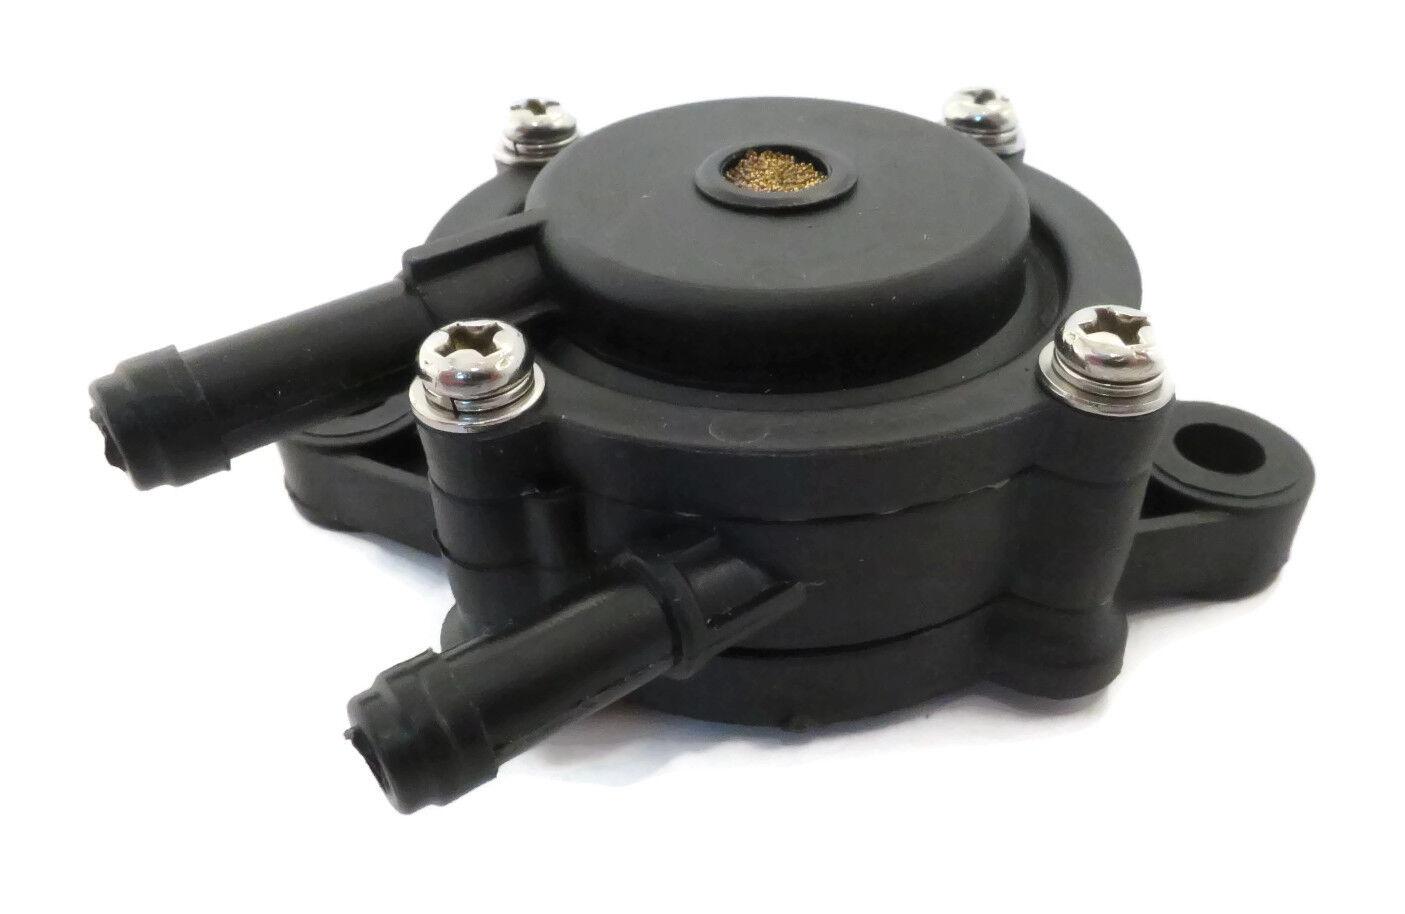 Fuel Pump For Briggs /& Stratton 202312 202317 202332 202336 202337 Engine